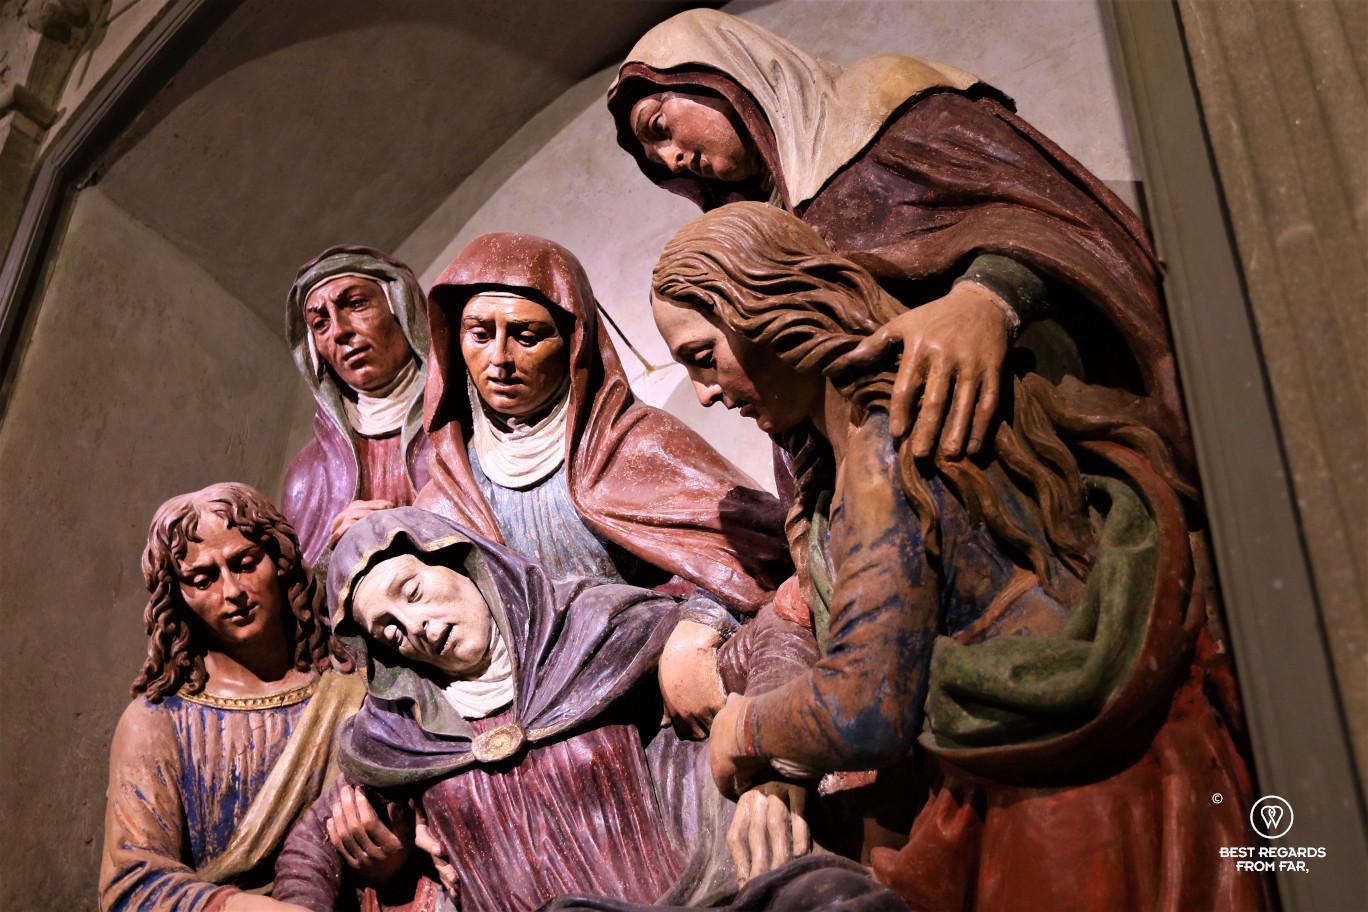 The Lady of Pain terracotta by Giovanni della Robbia's school (1516), San Vivaldo, Tuscany.